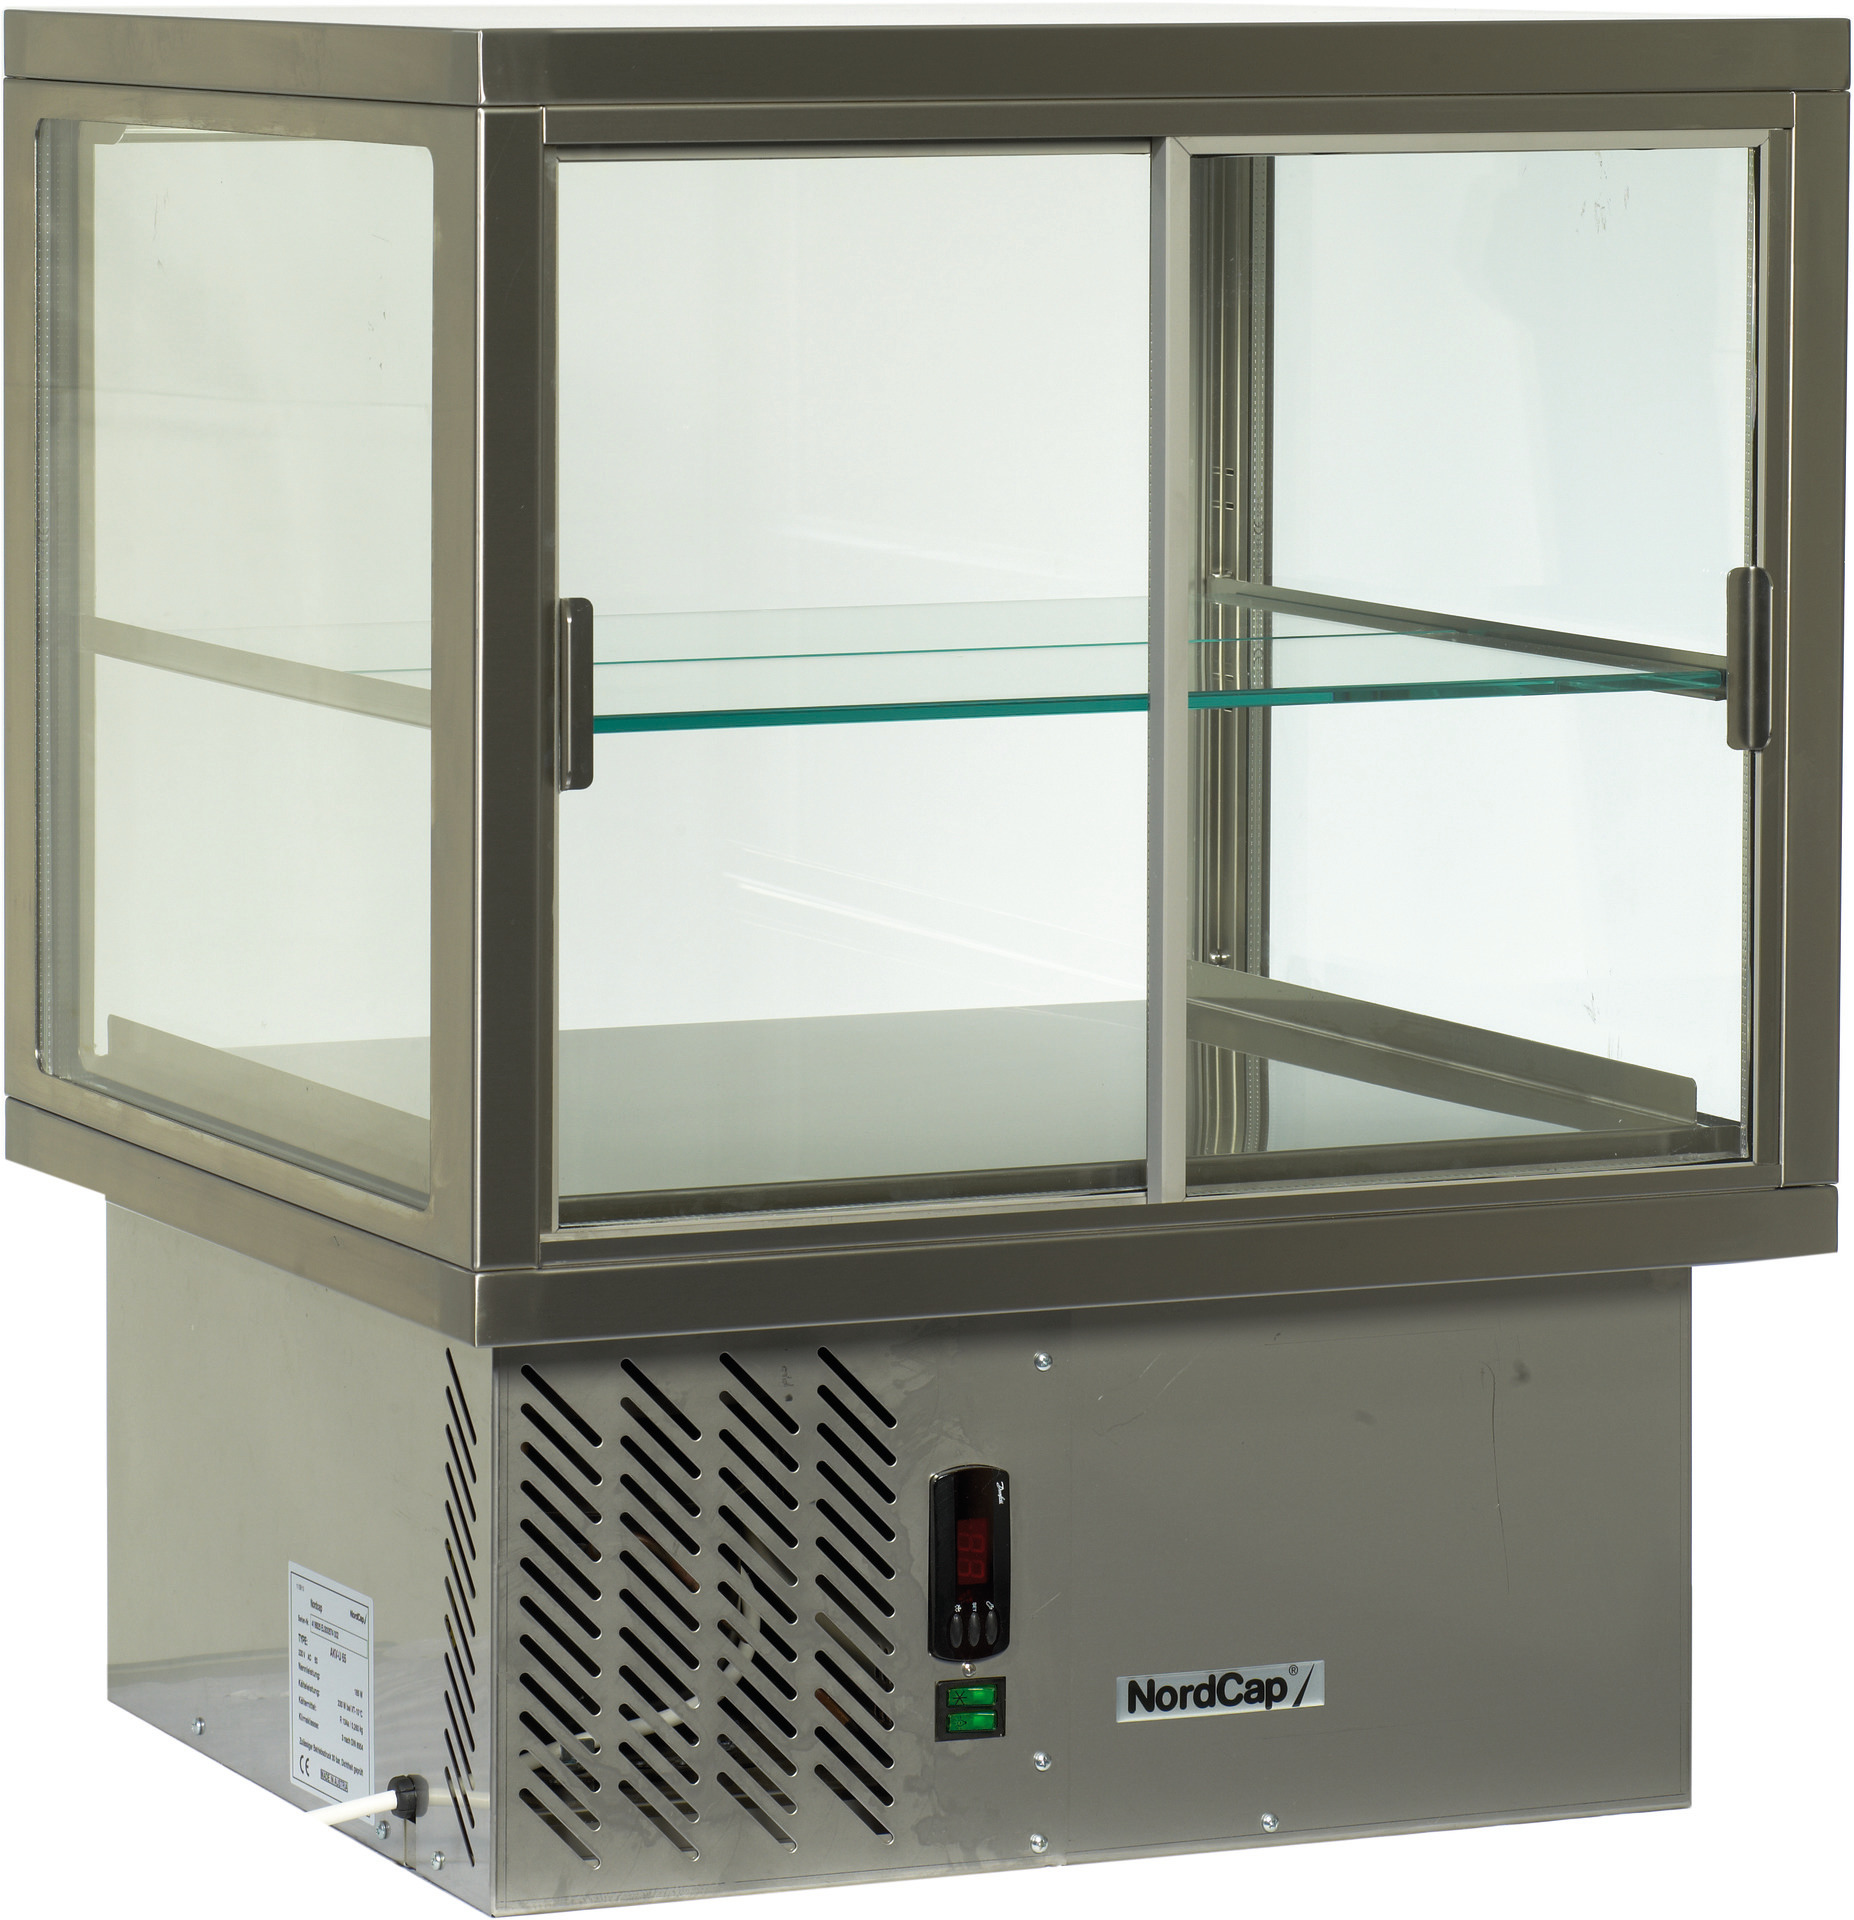 Aufsatzkühlvitrine 4-seitig verglast /  Nettoinhalt 141,00 l / steckerfertig